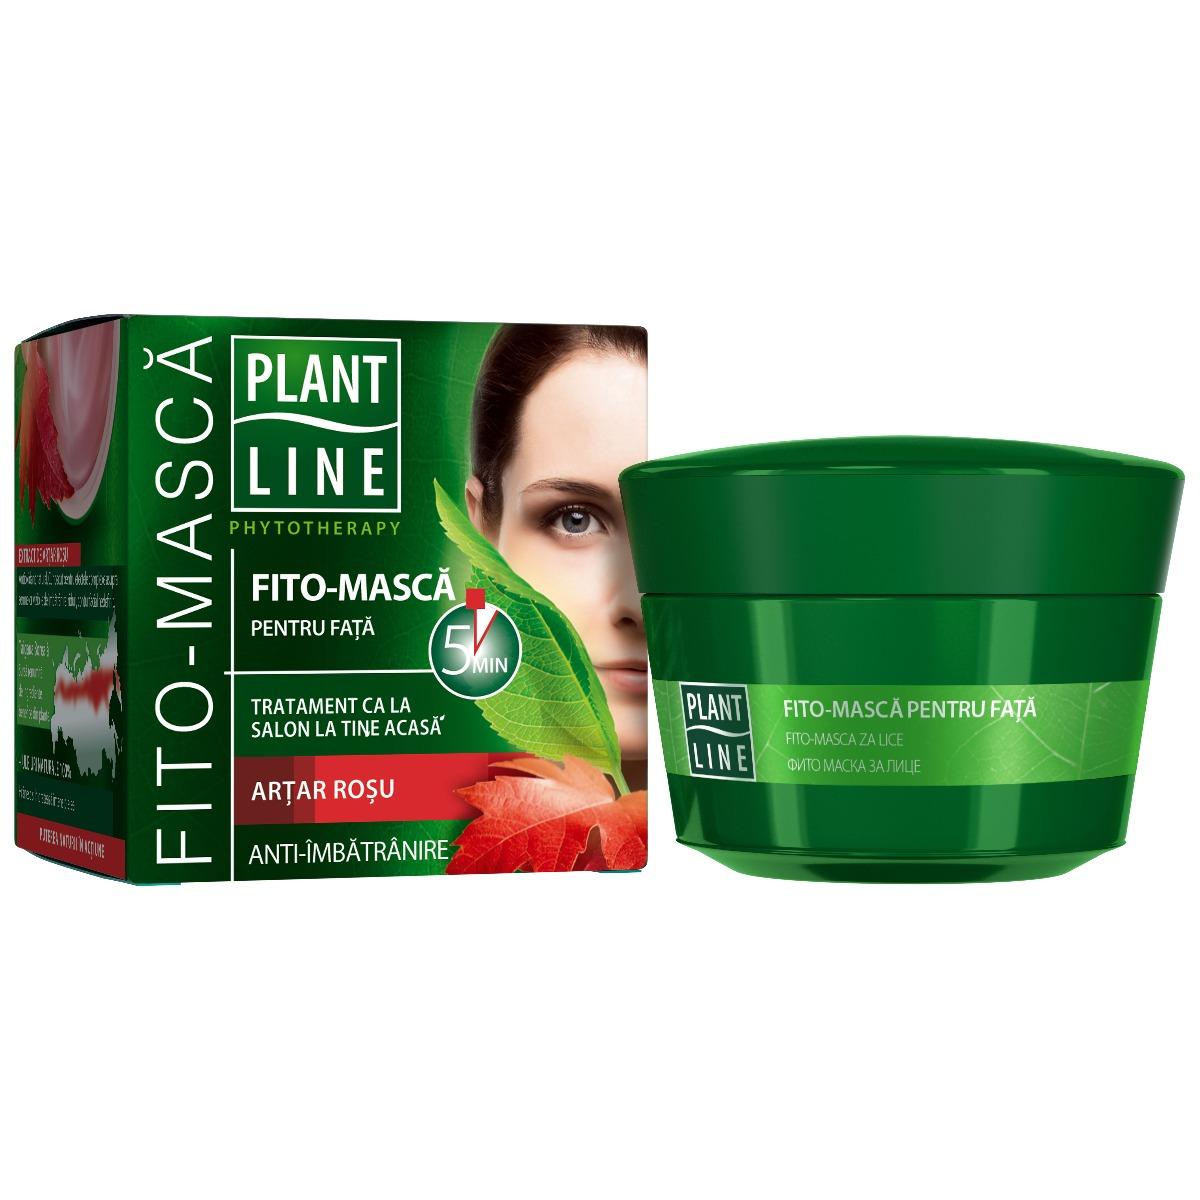 Masca de fata anti-imbatranire Artar Rosu Plant Line, 45 ml imagine